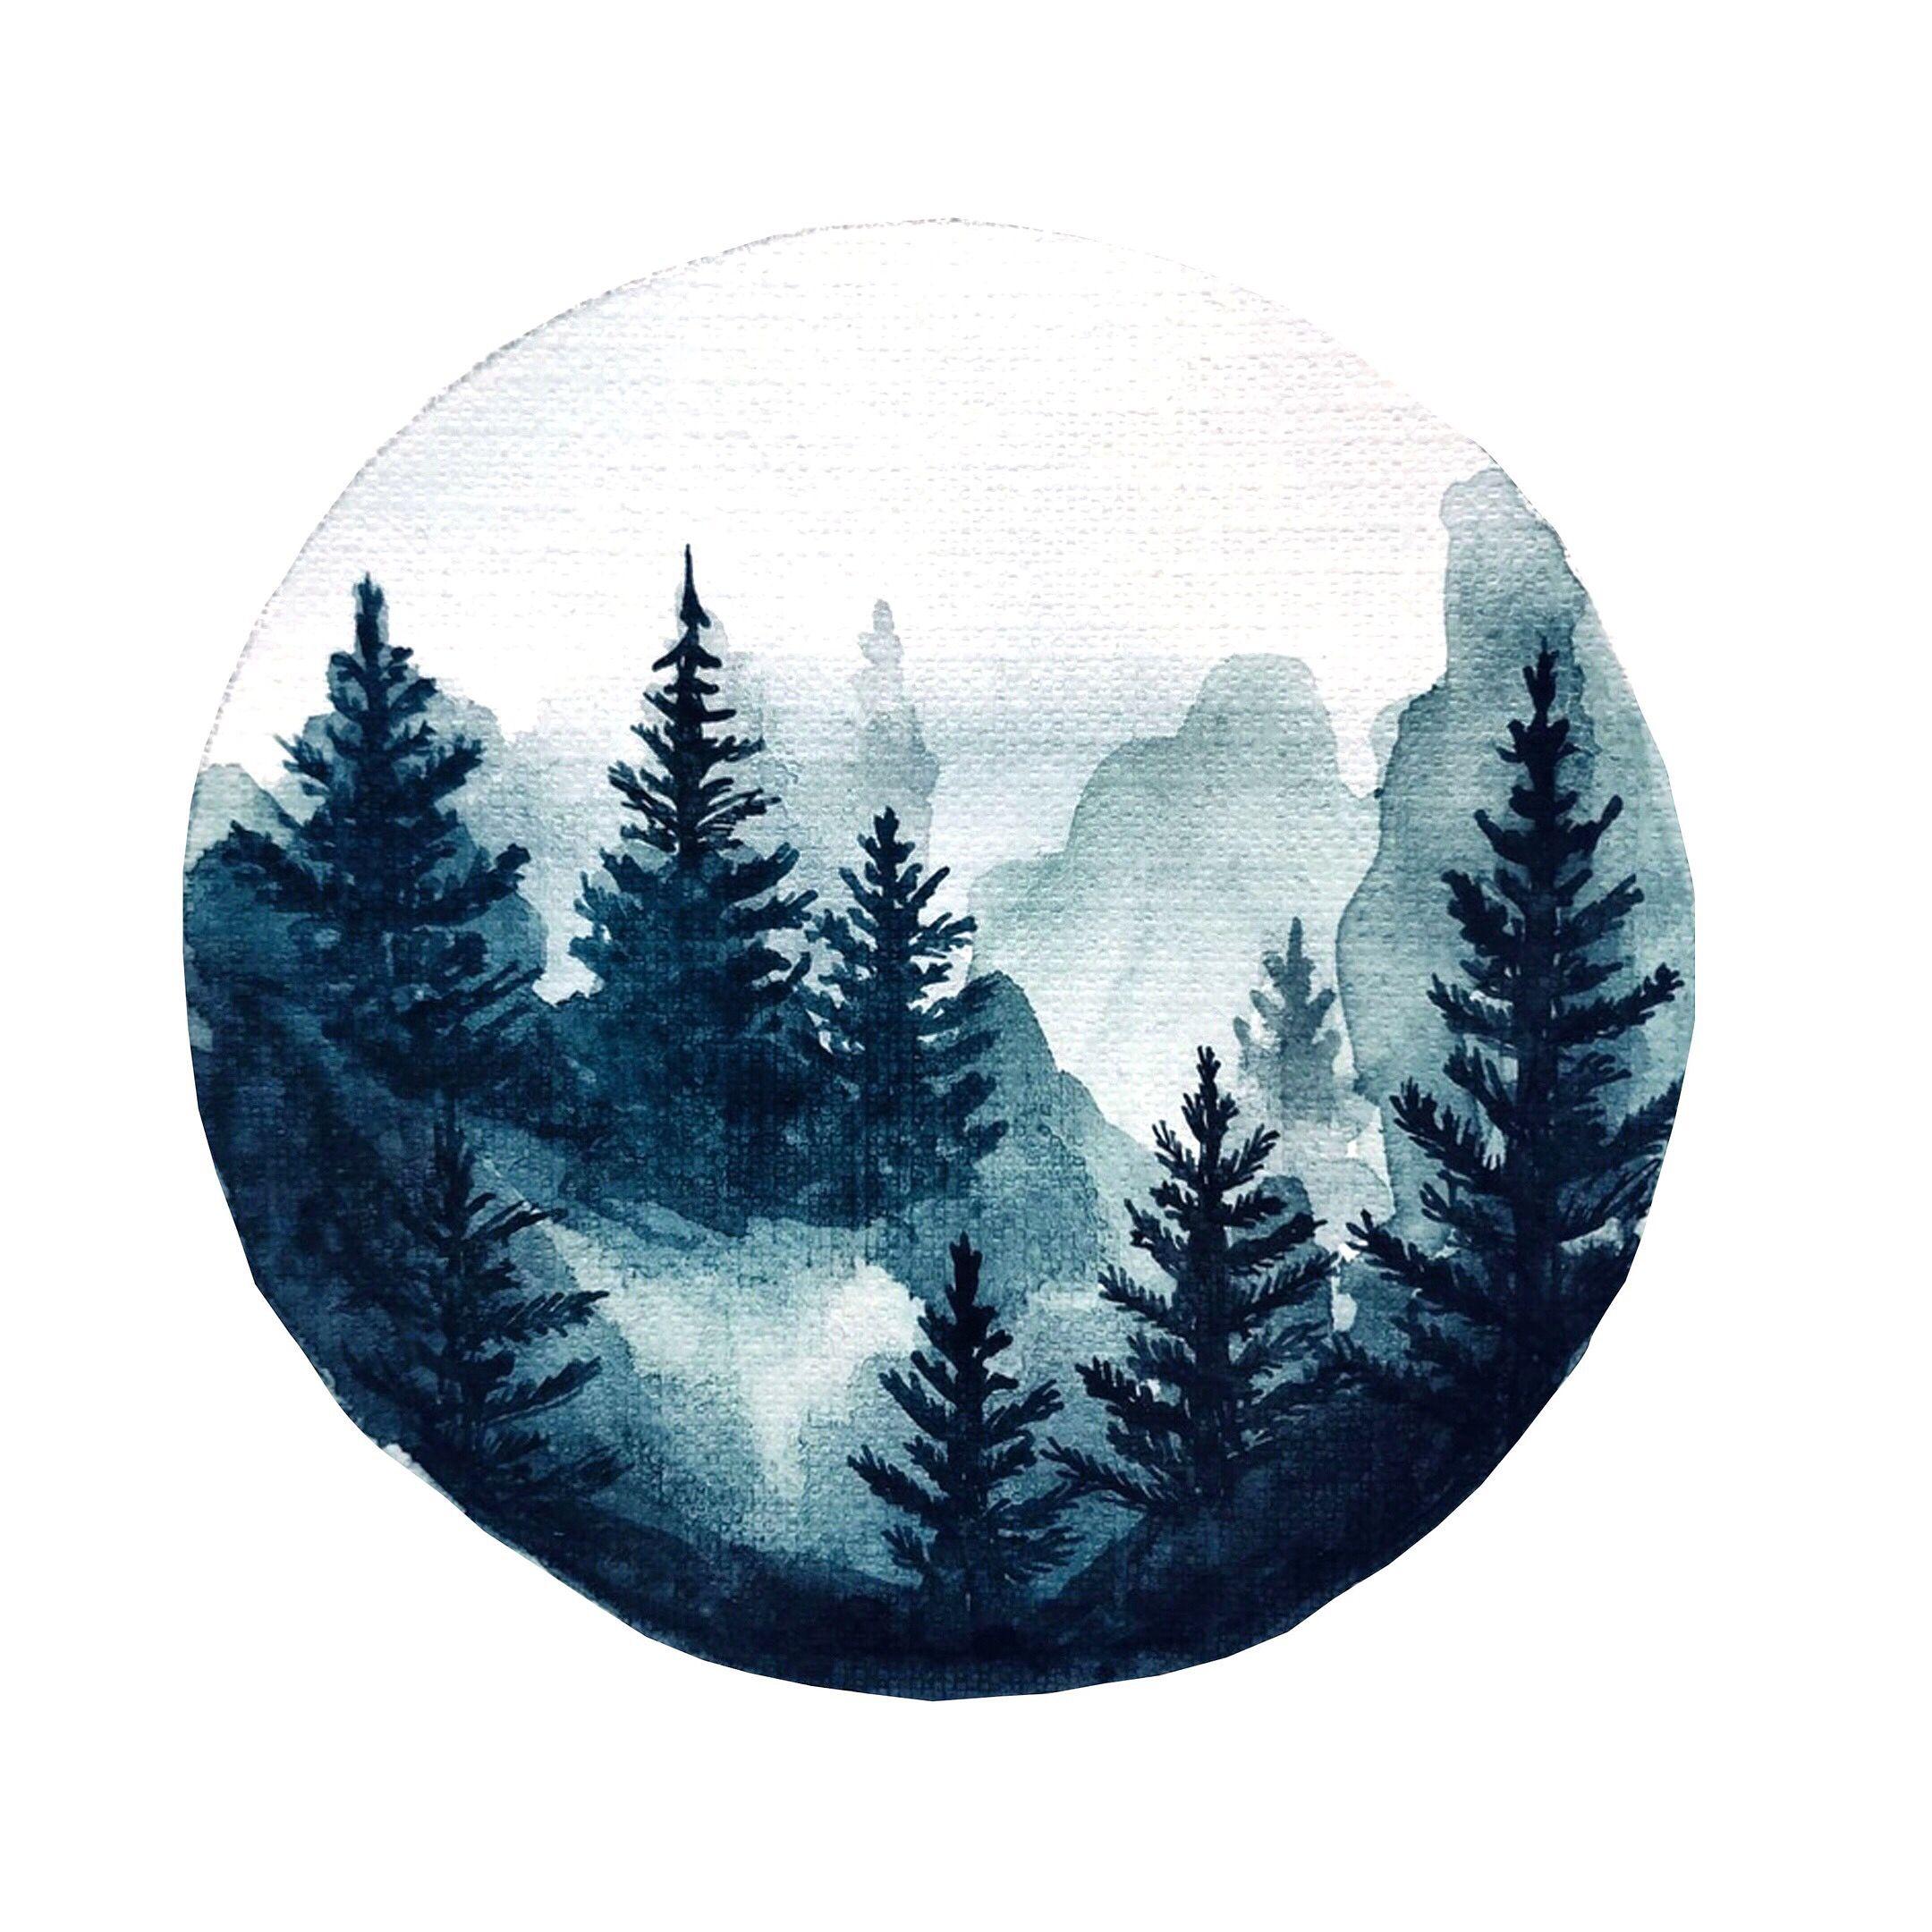 Scandinavian style forest illustration